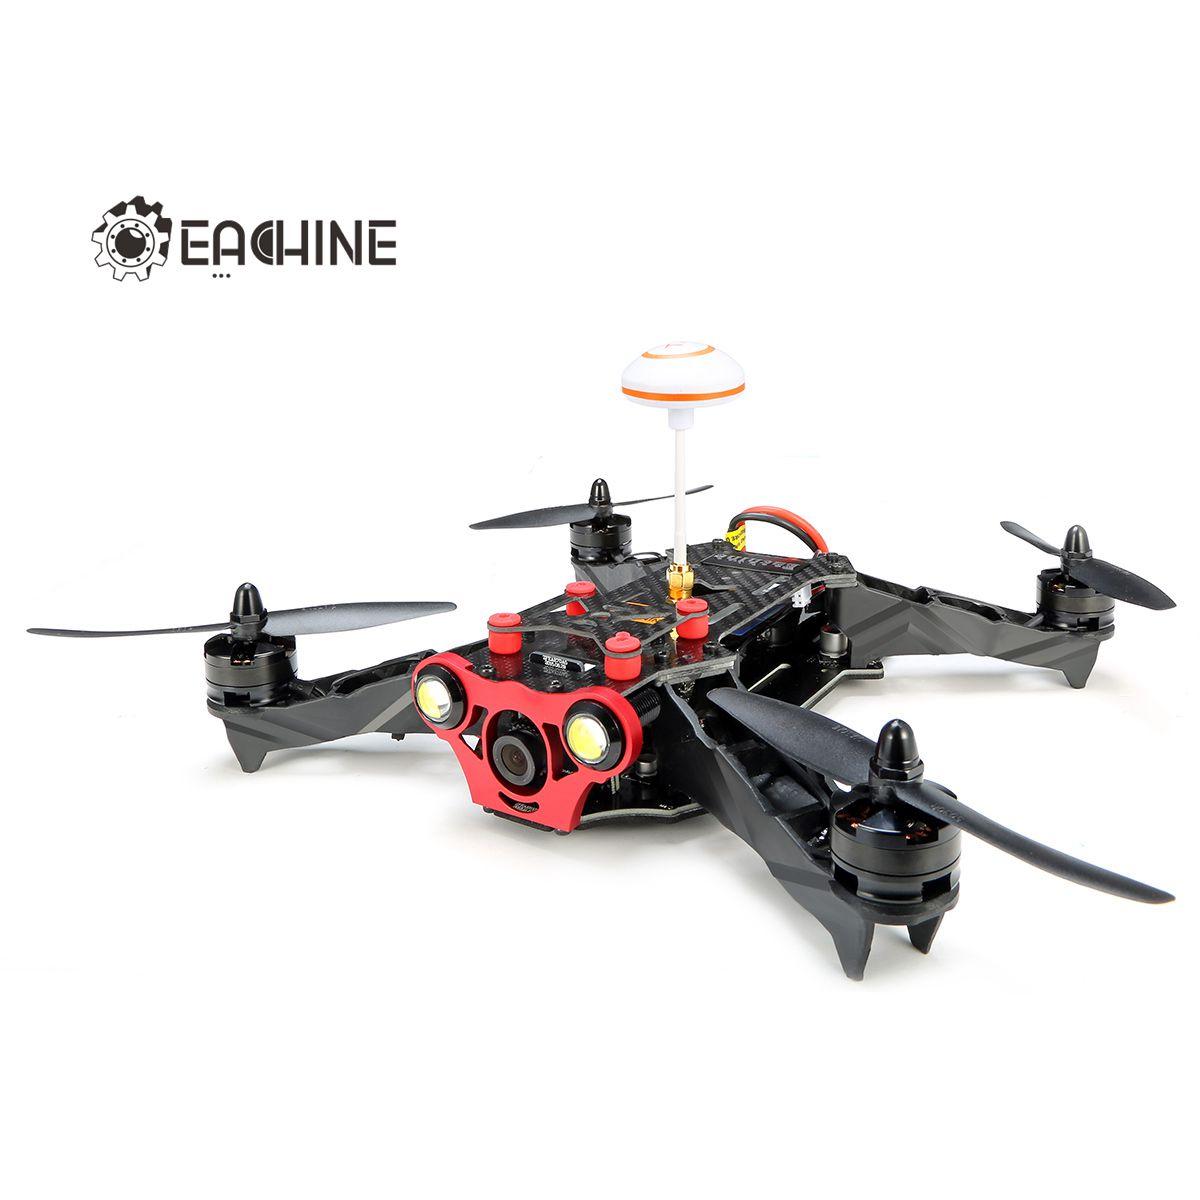 Eachine Racer 250 FPV Drone Built Transmitter OSD HD Camera ARF Version